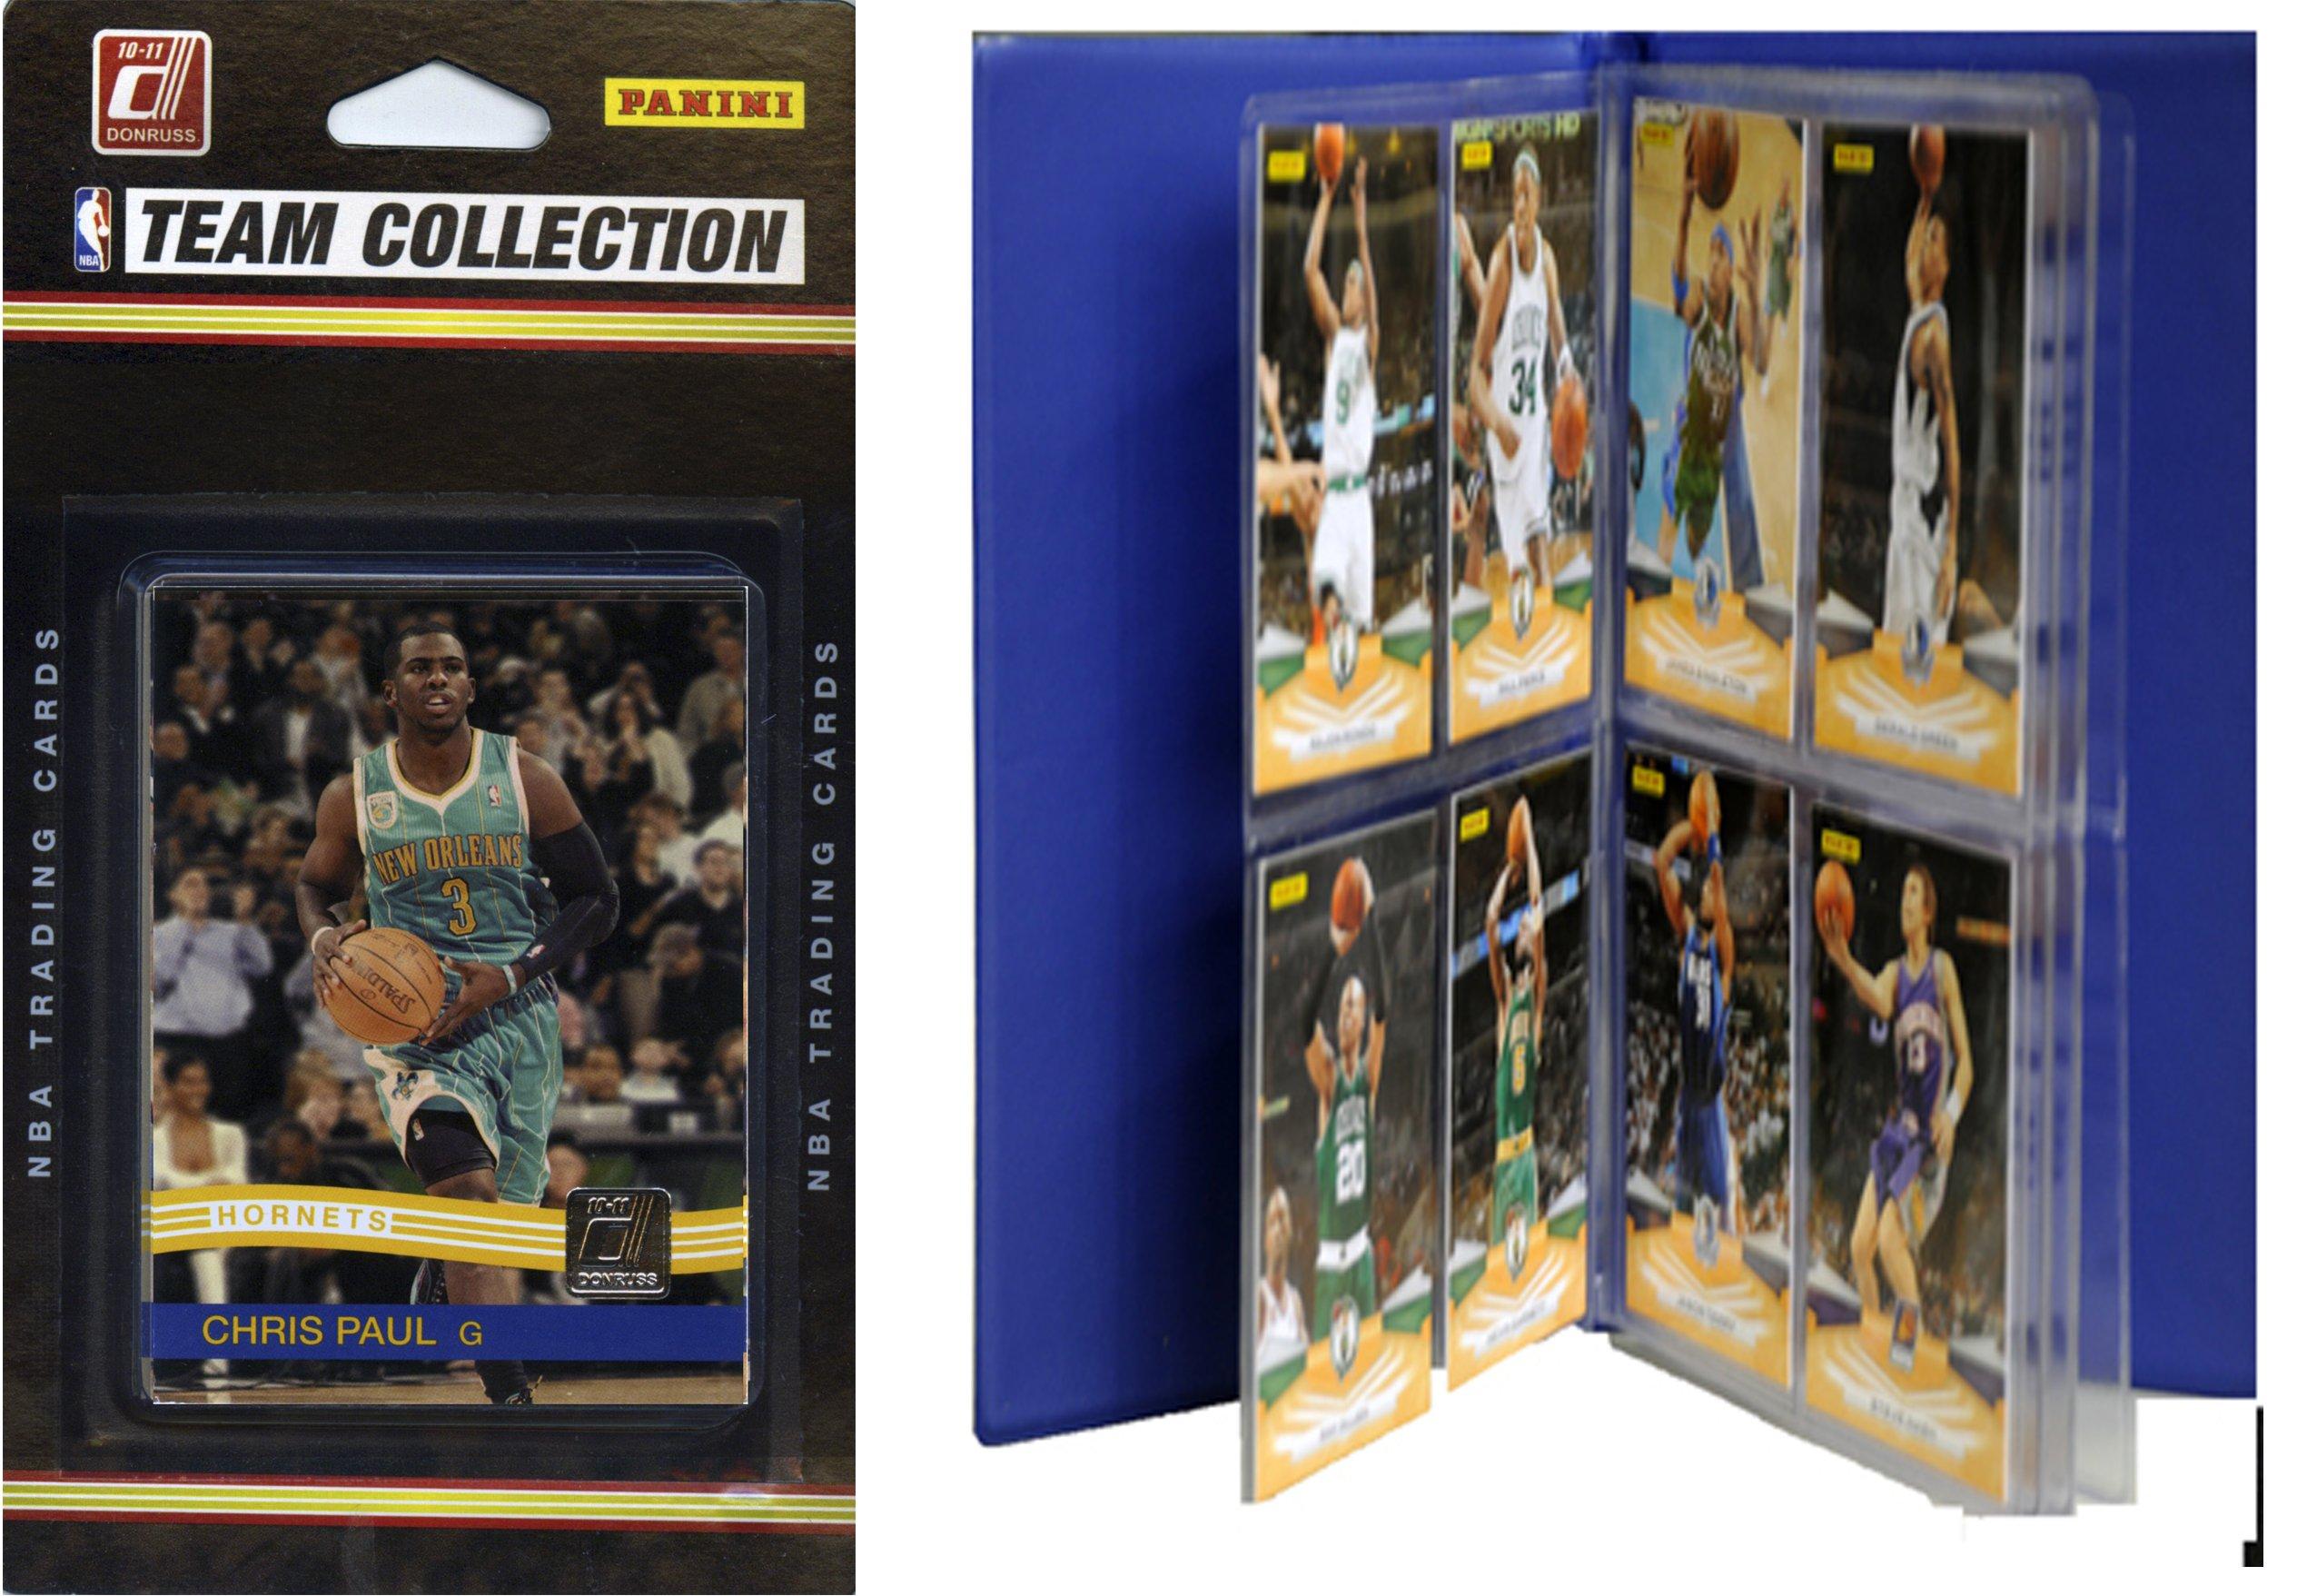 NBA New Orleans Hornets Licensed 2010-11 Donruss Team Set Plus Storage Album by C&I Collectables